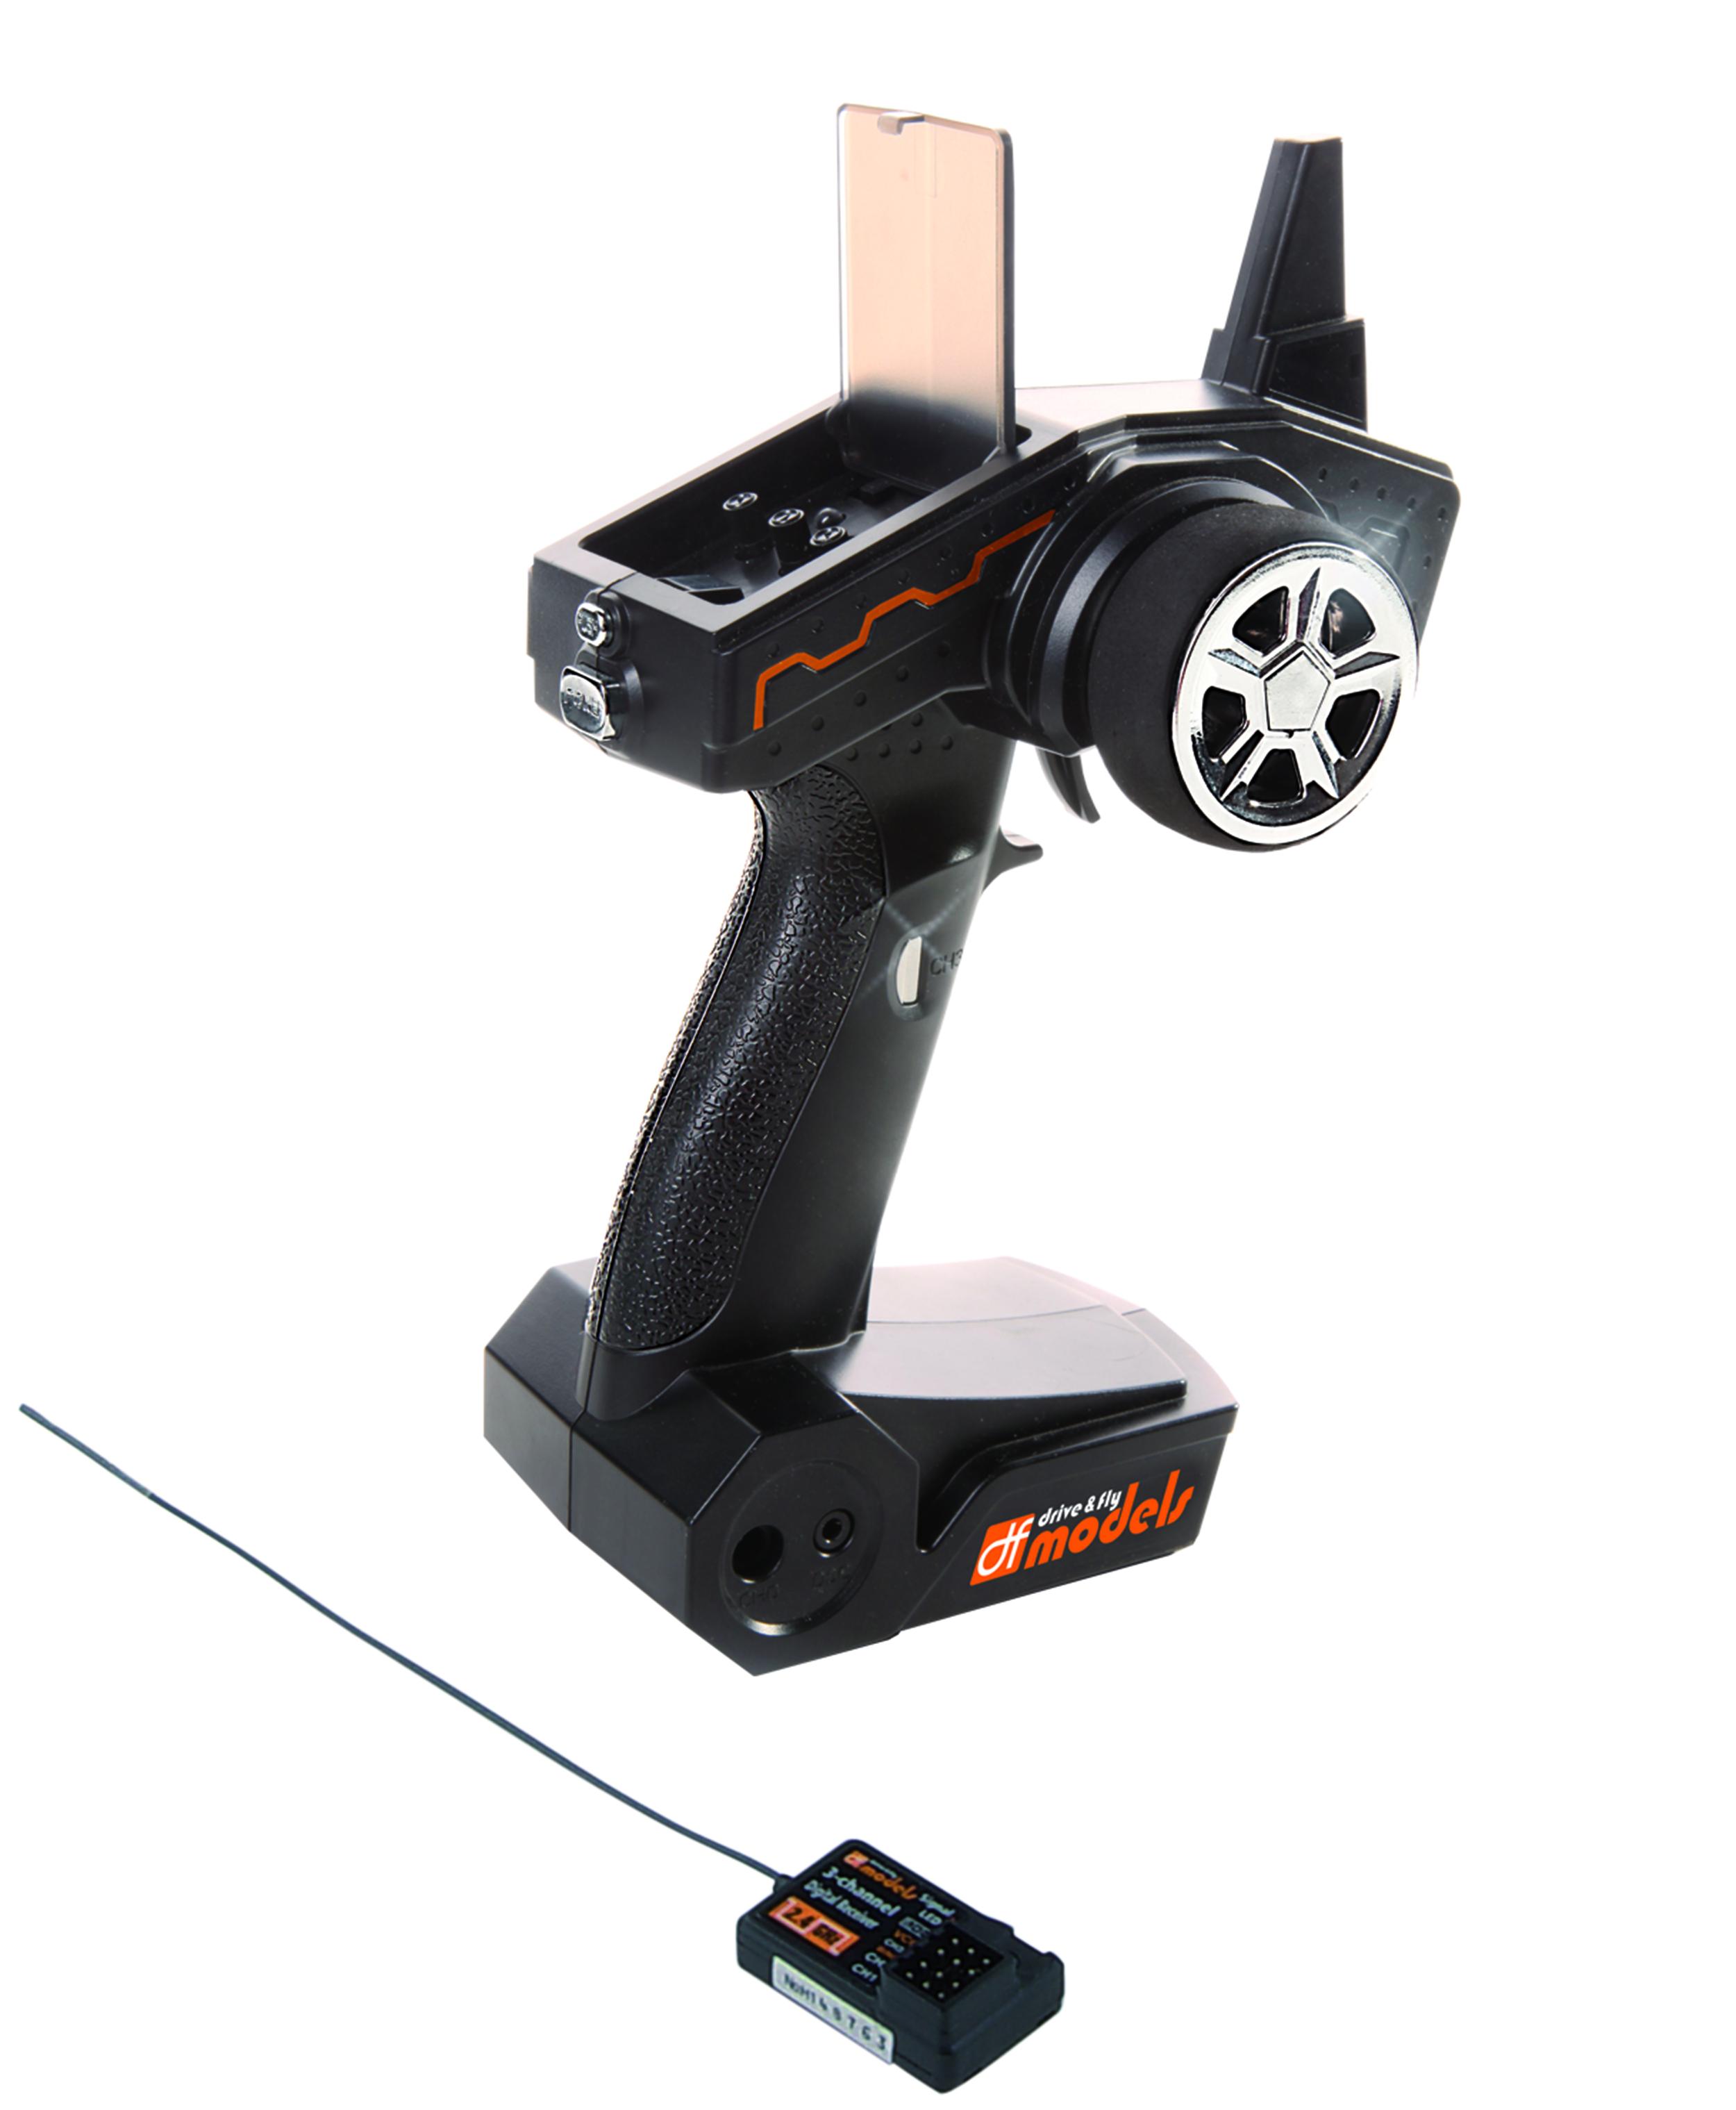 Vysílač s přijímačem 3ch, 2,4 GHz